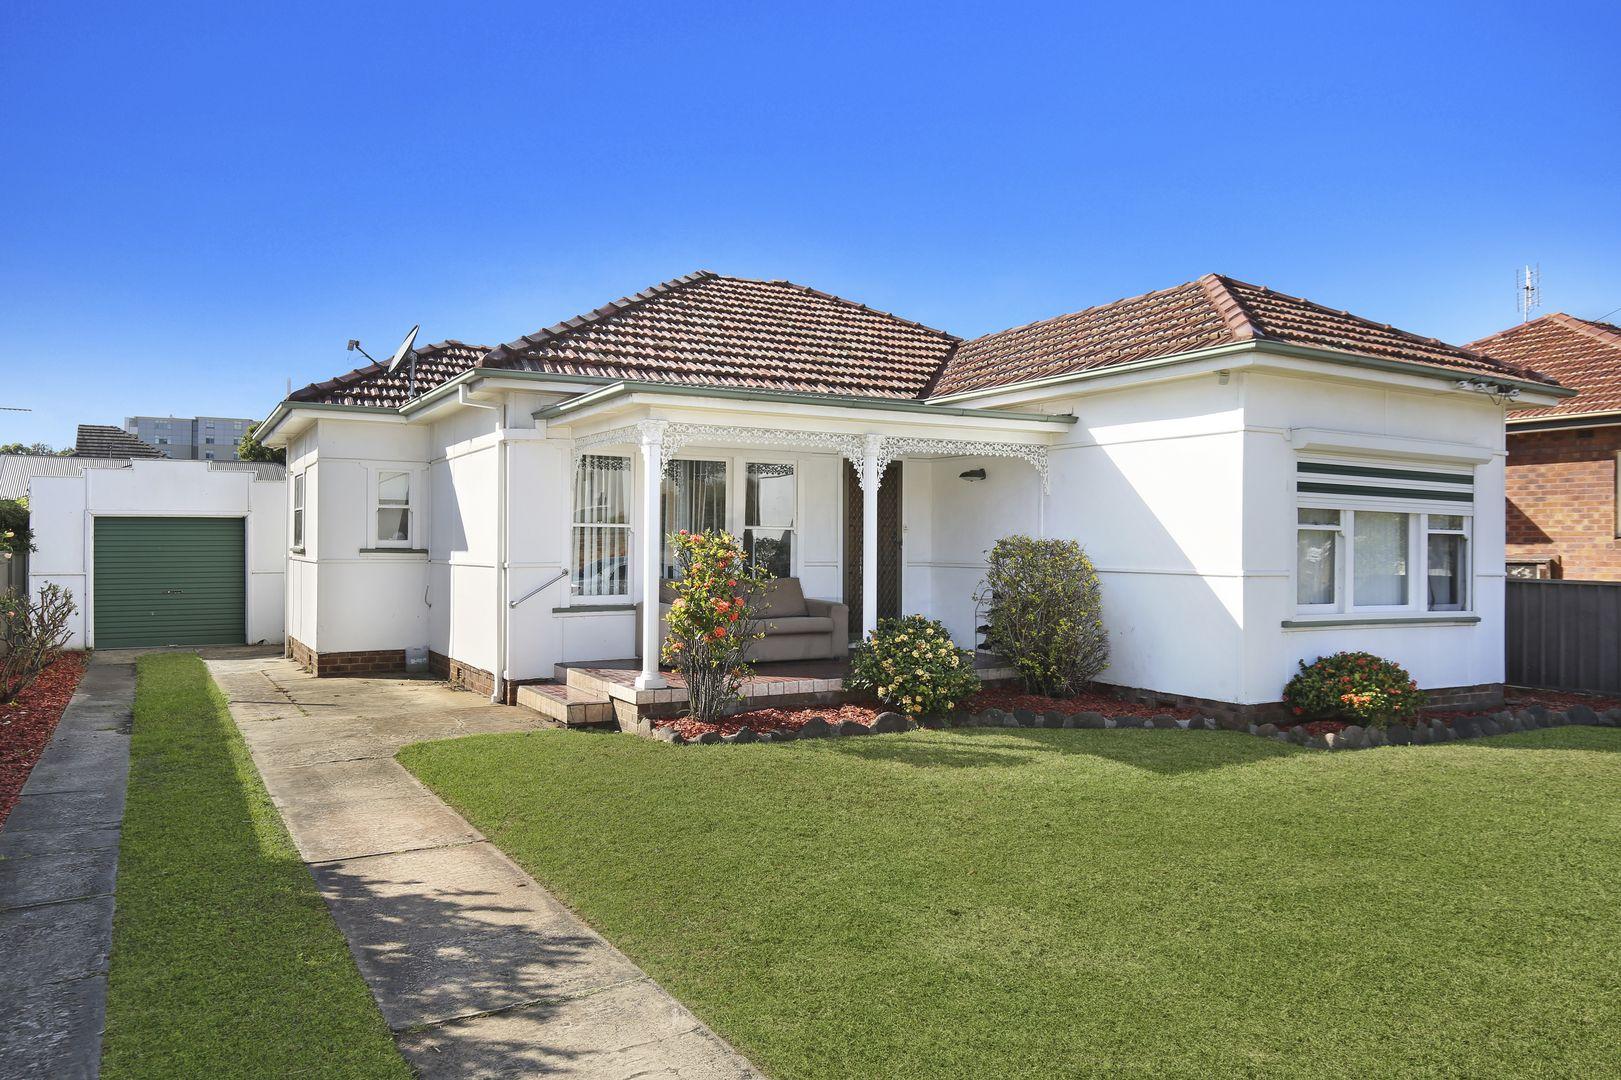 135 Kembla  Street, Wollongong NSW 2500, Image 0